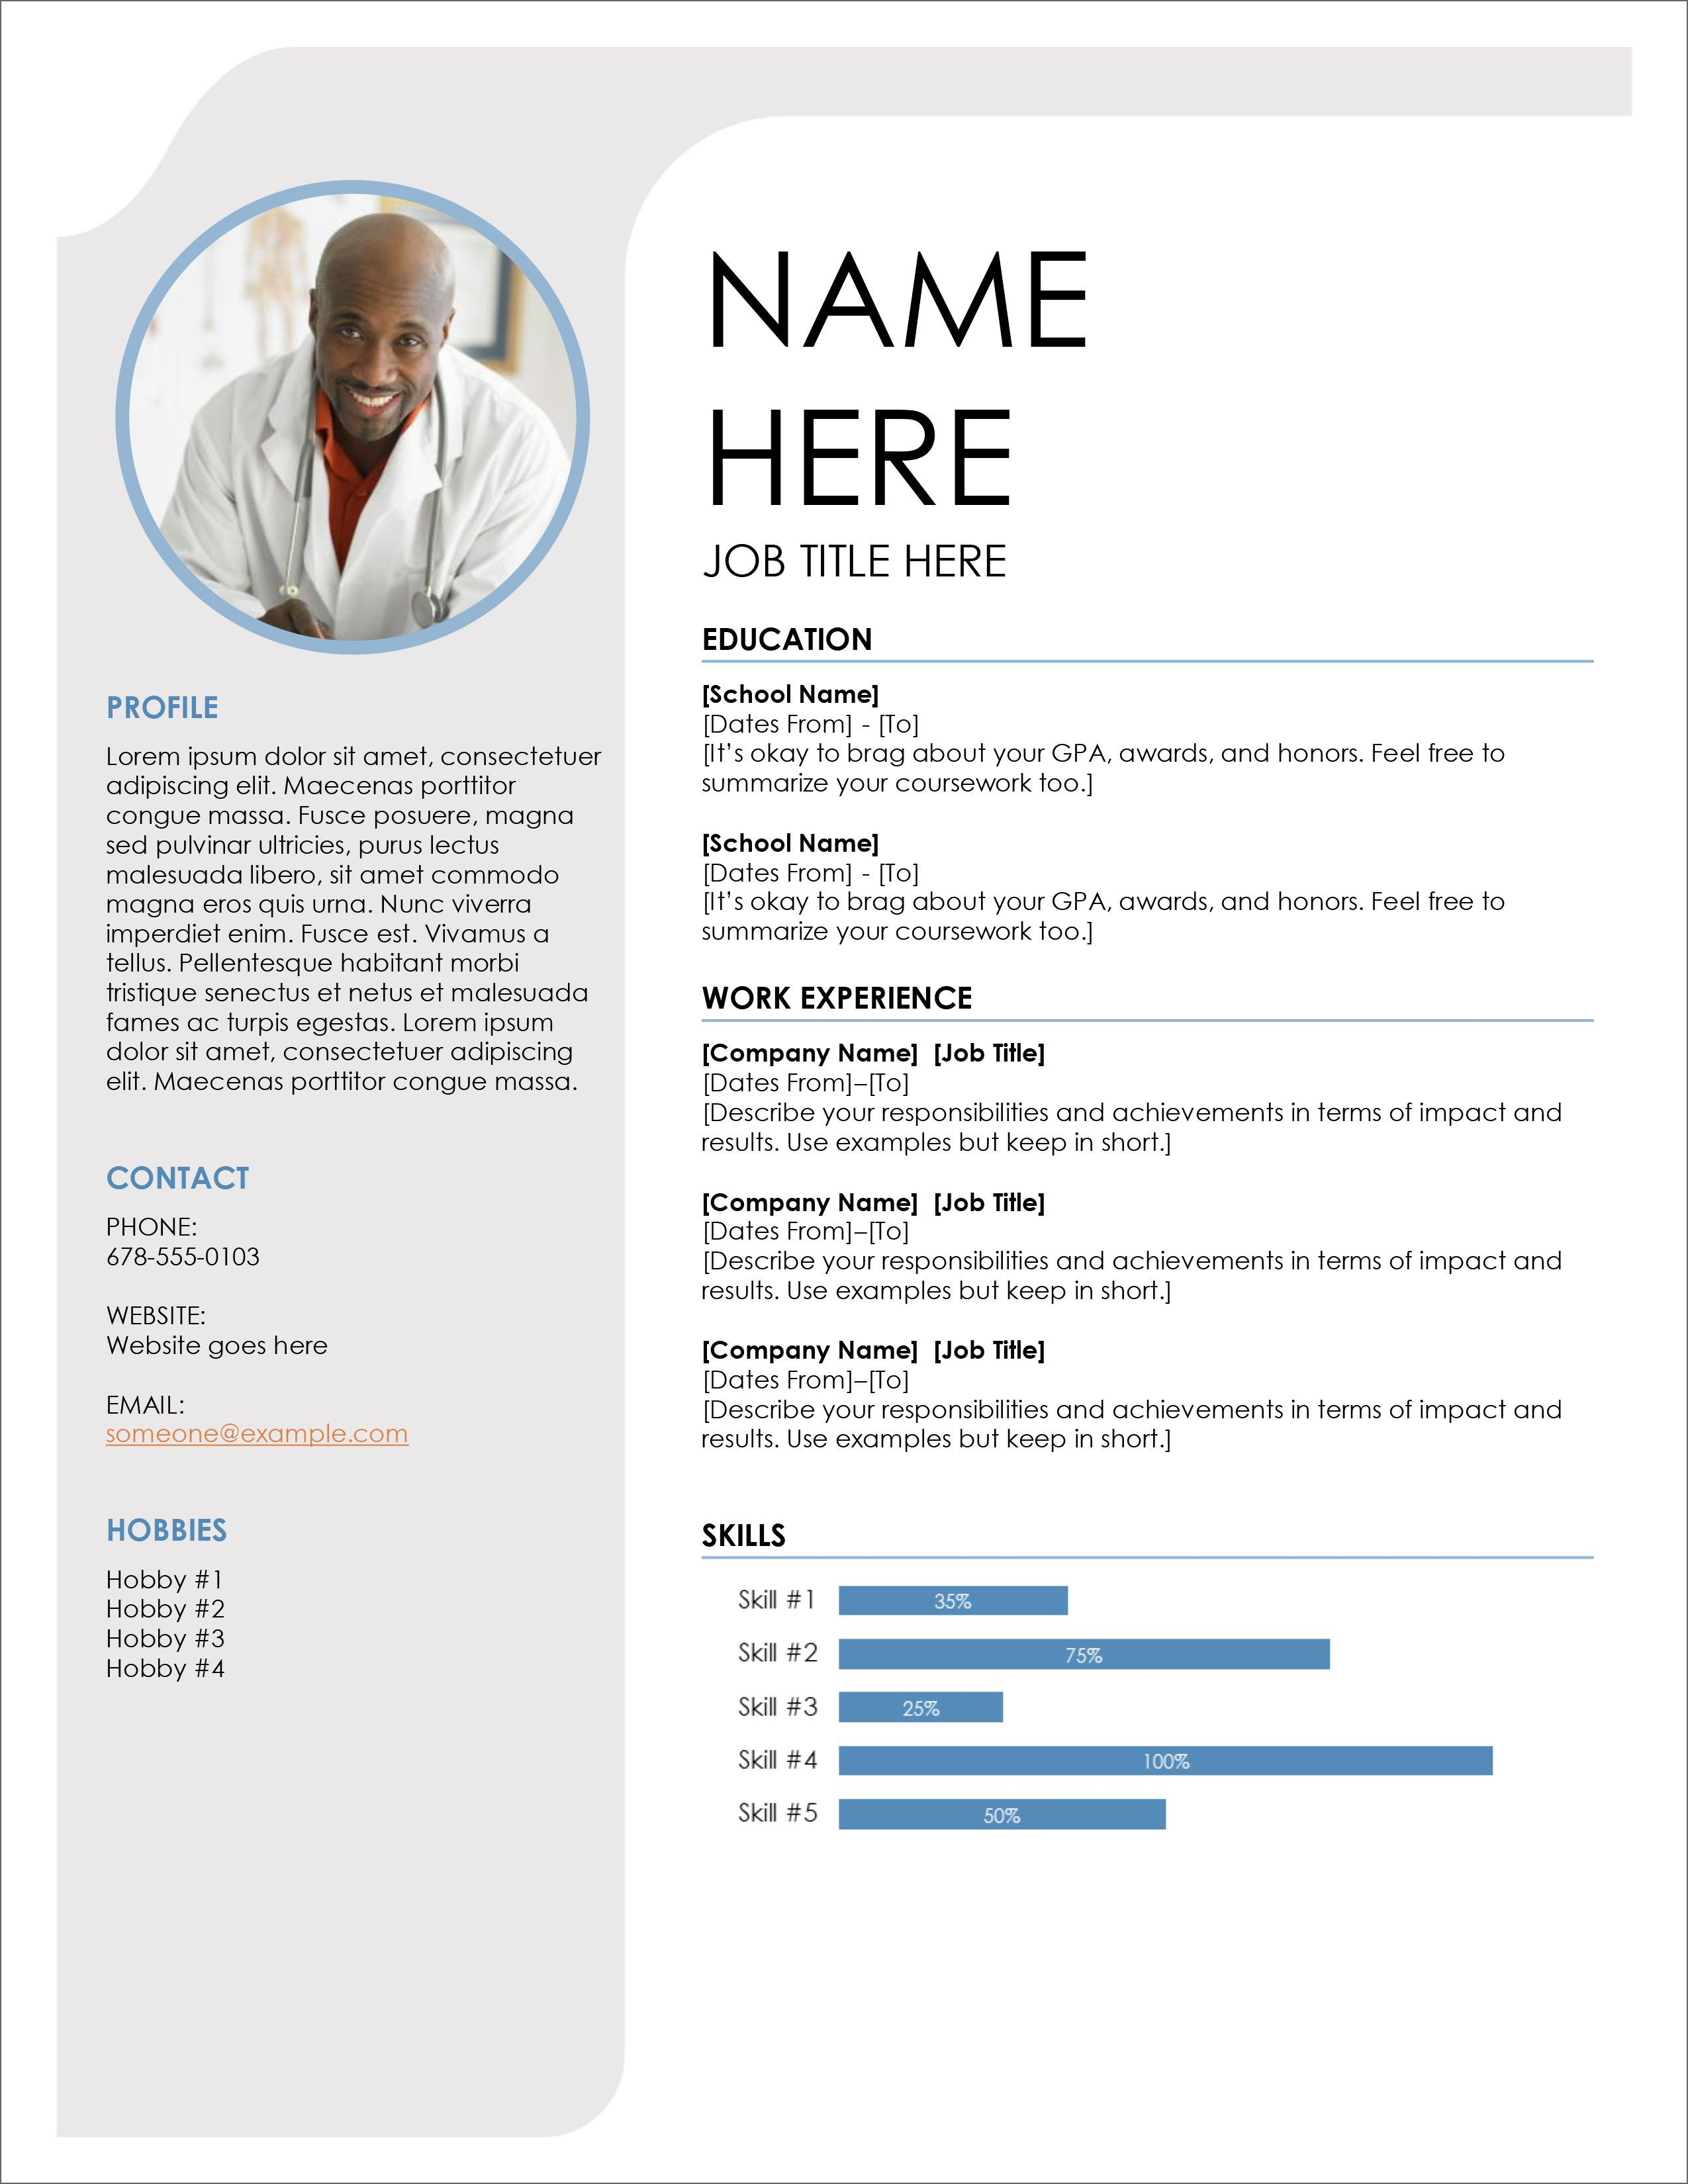 Free Job Resume Template Addictionary